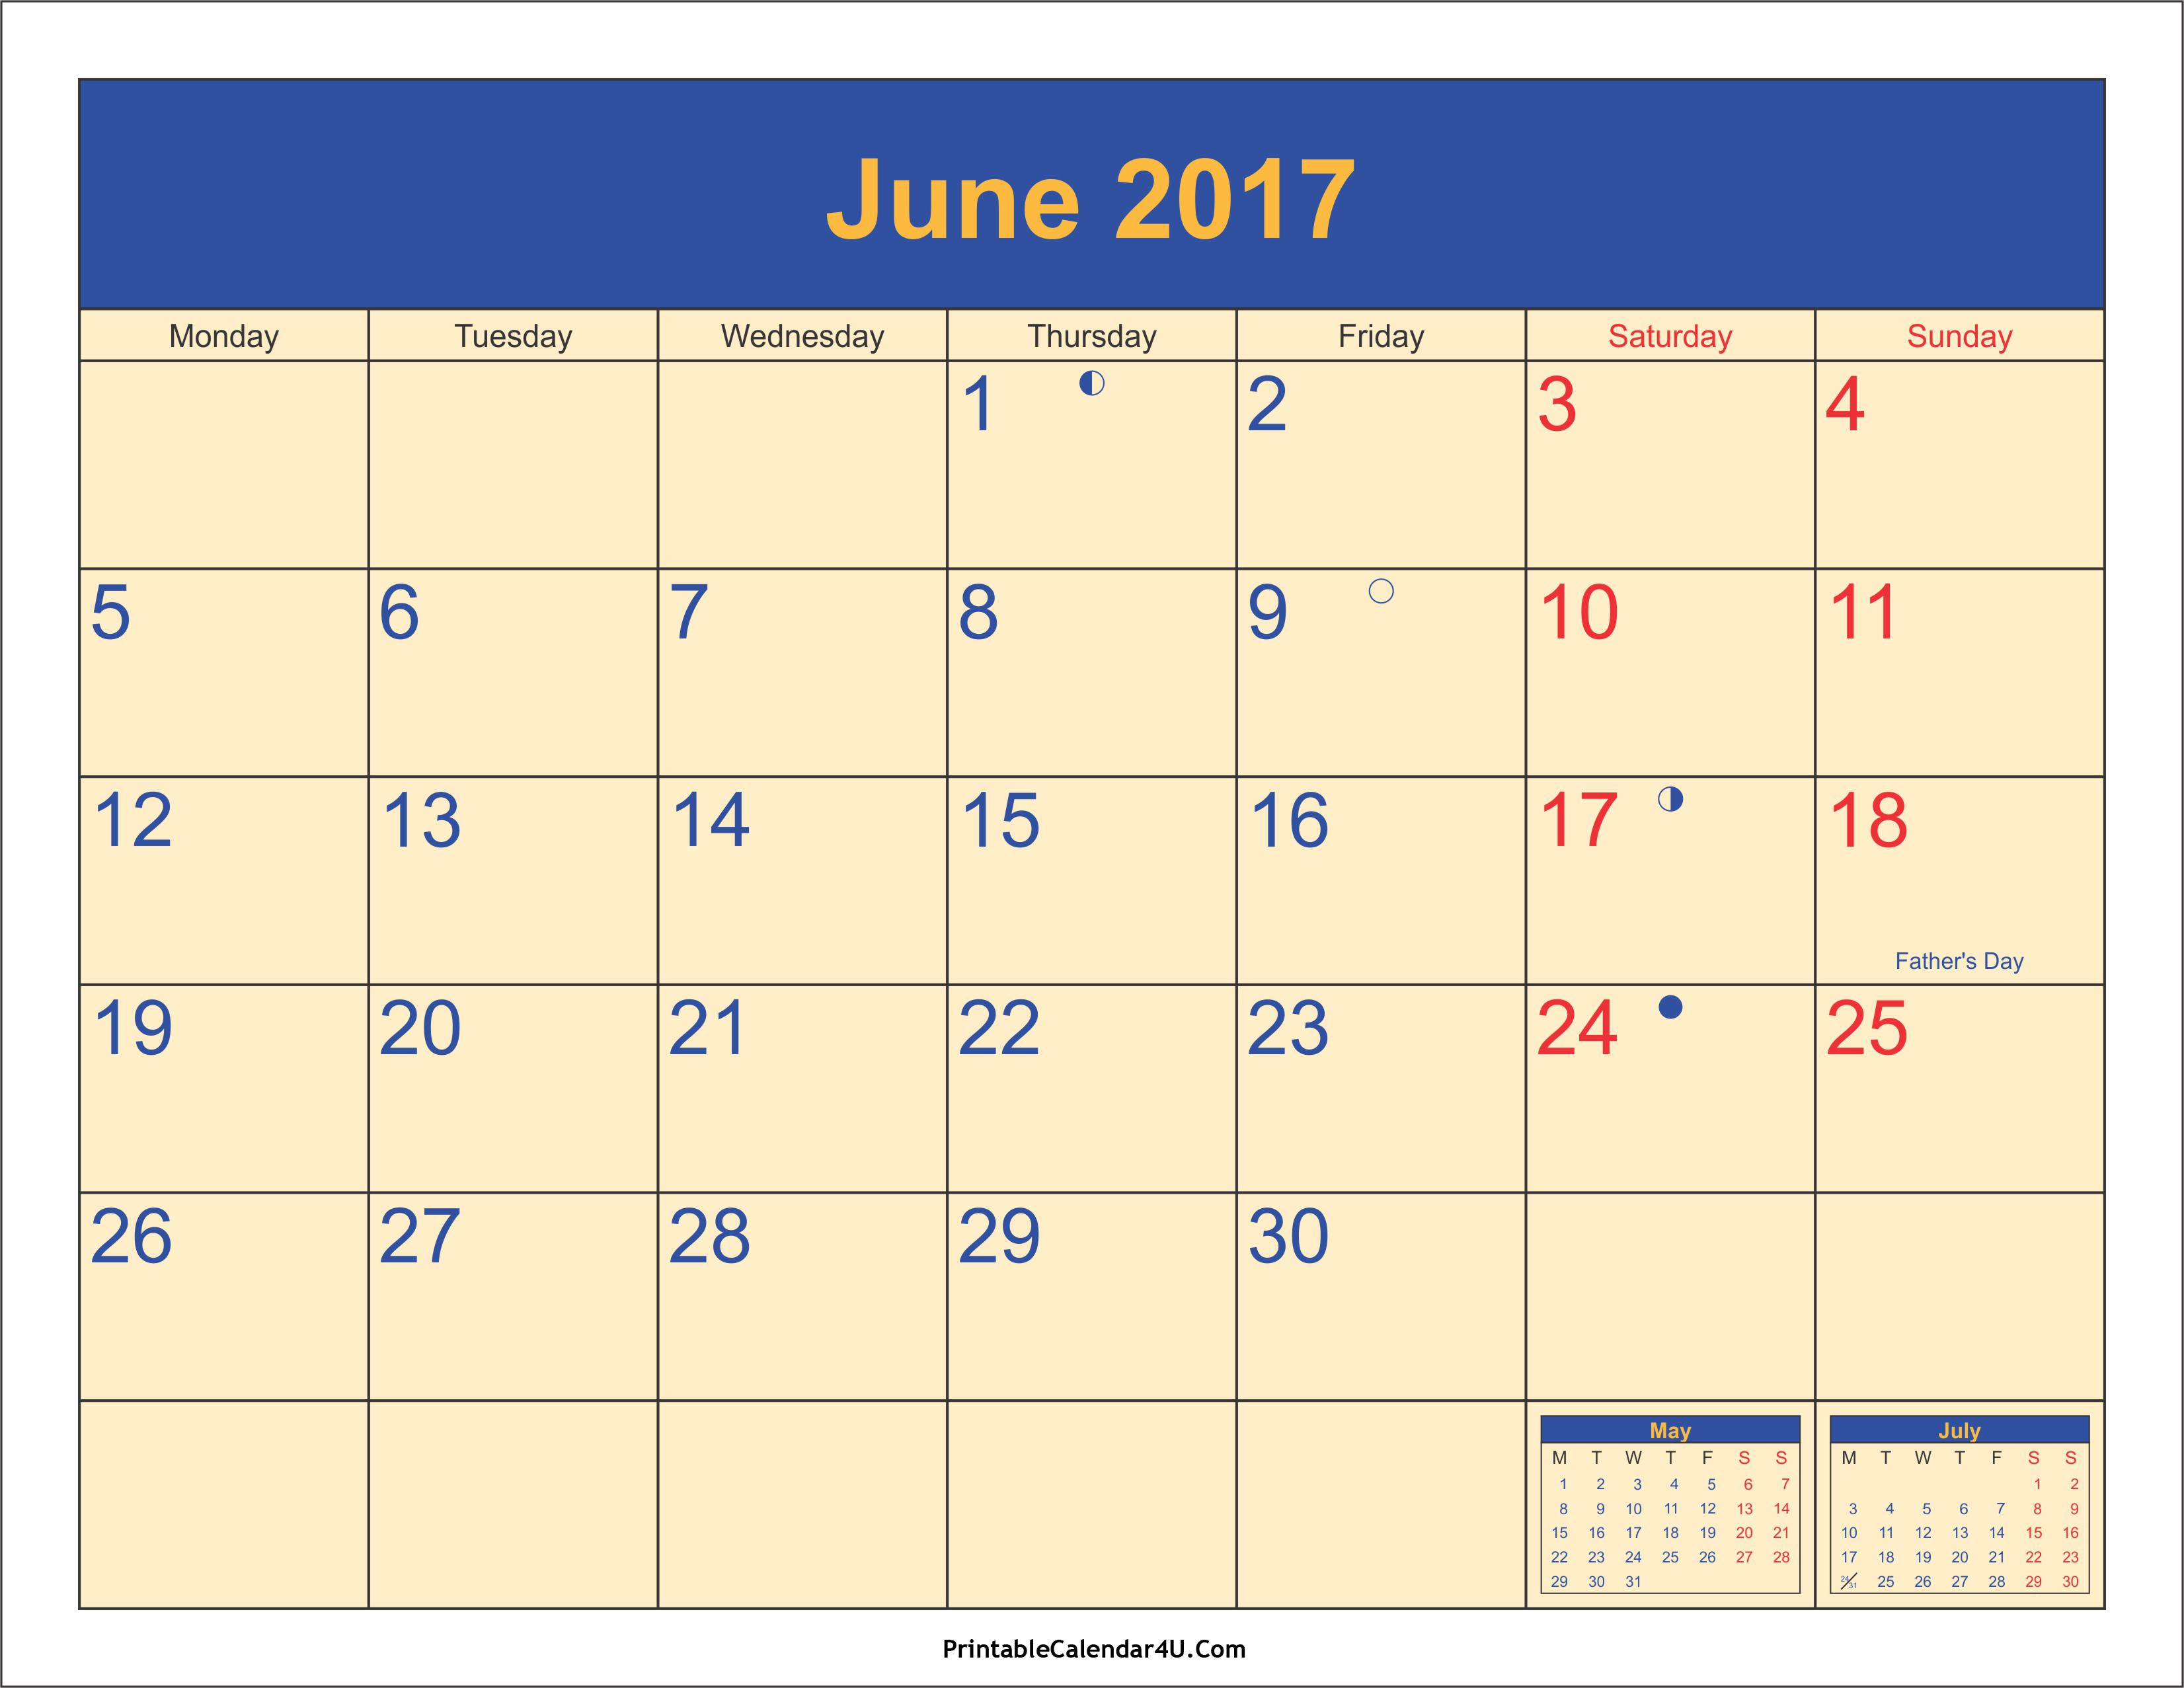 June 2017 Calendar With Holidays | printable calendar templates